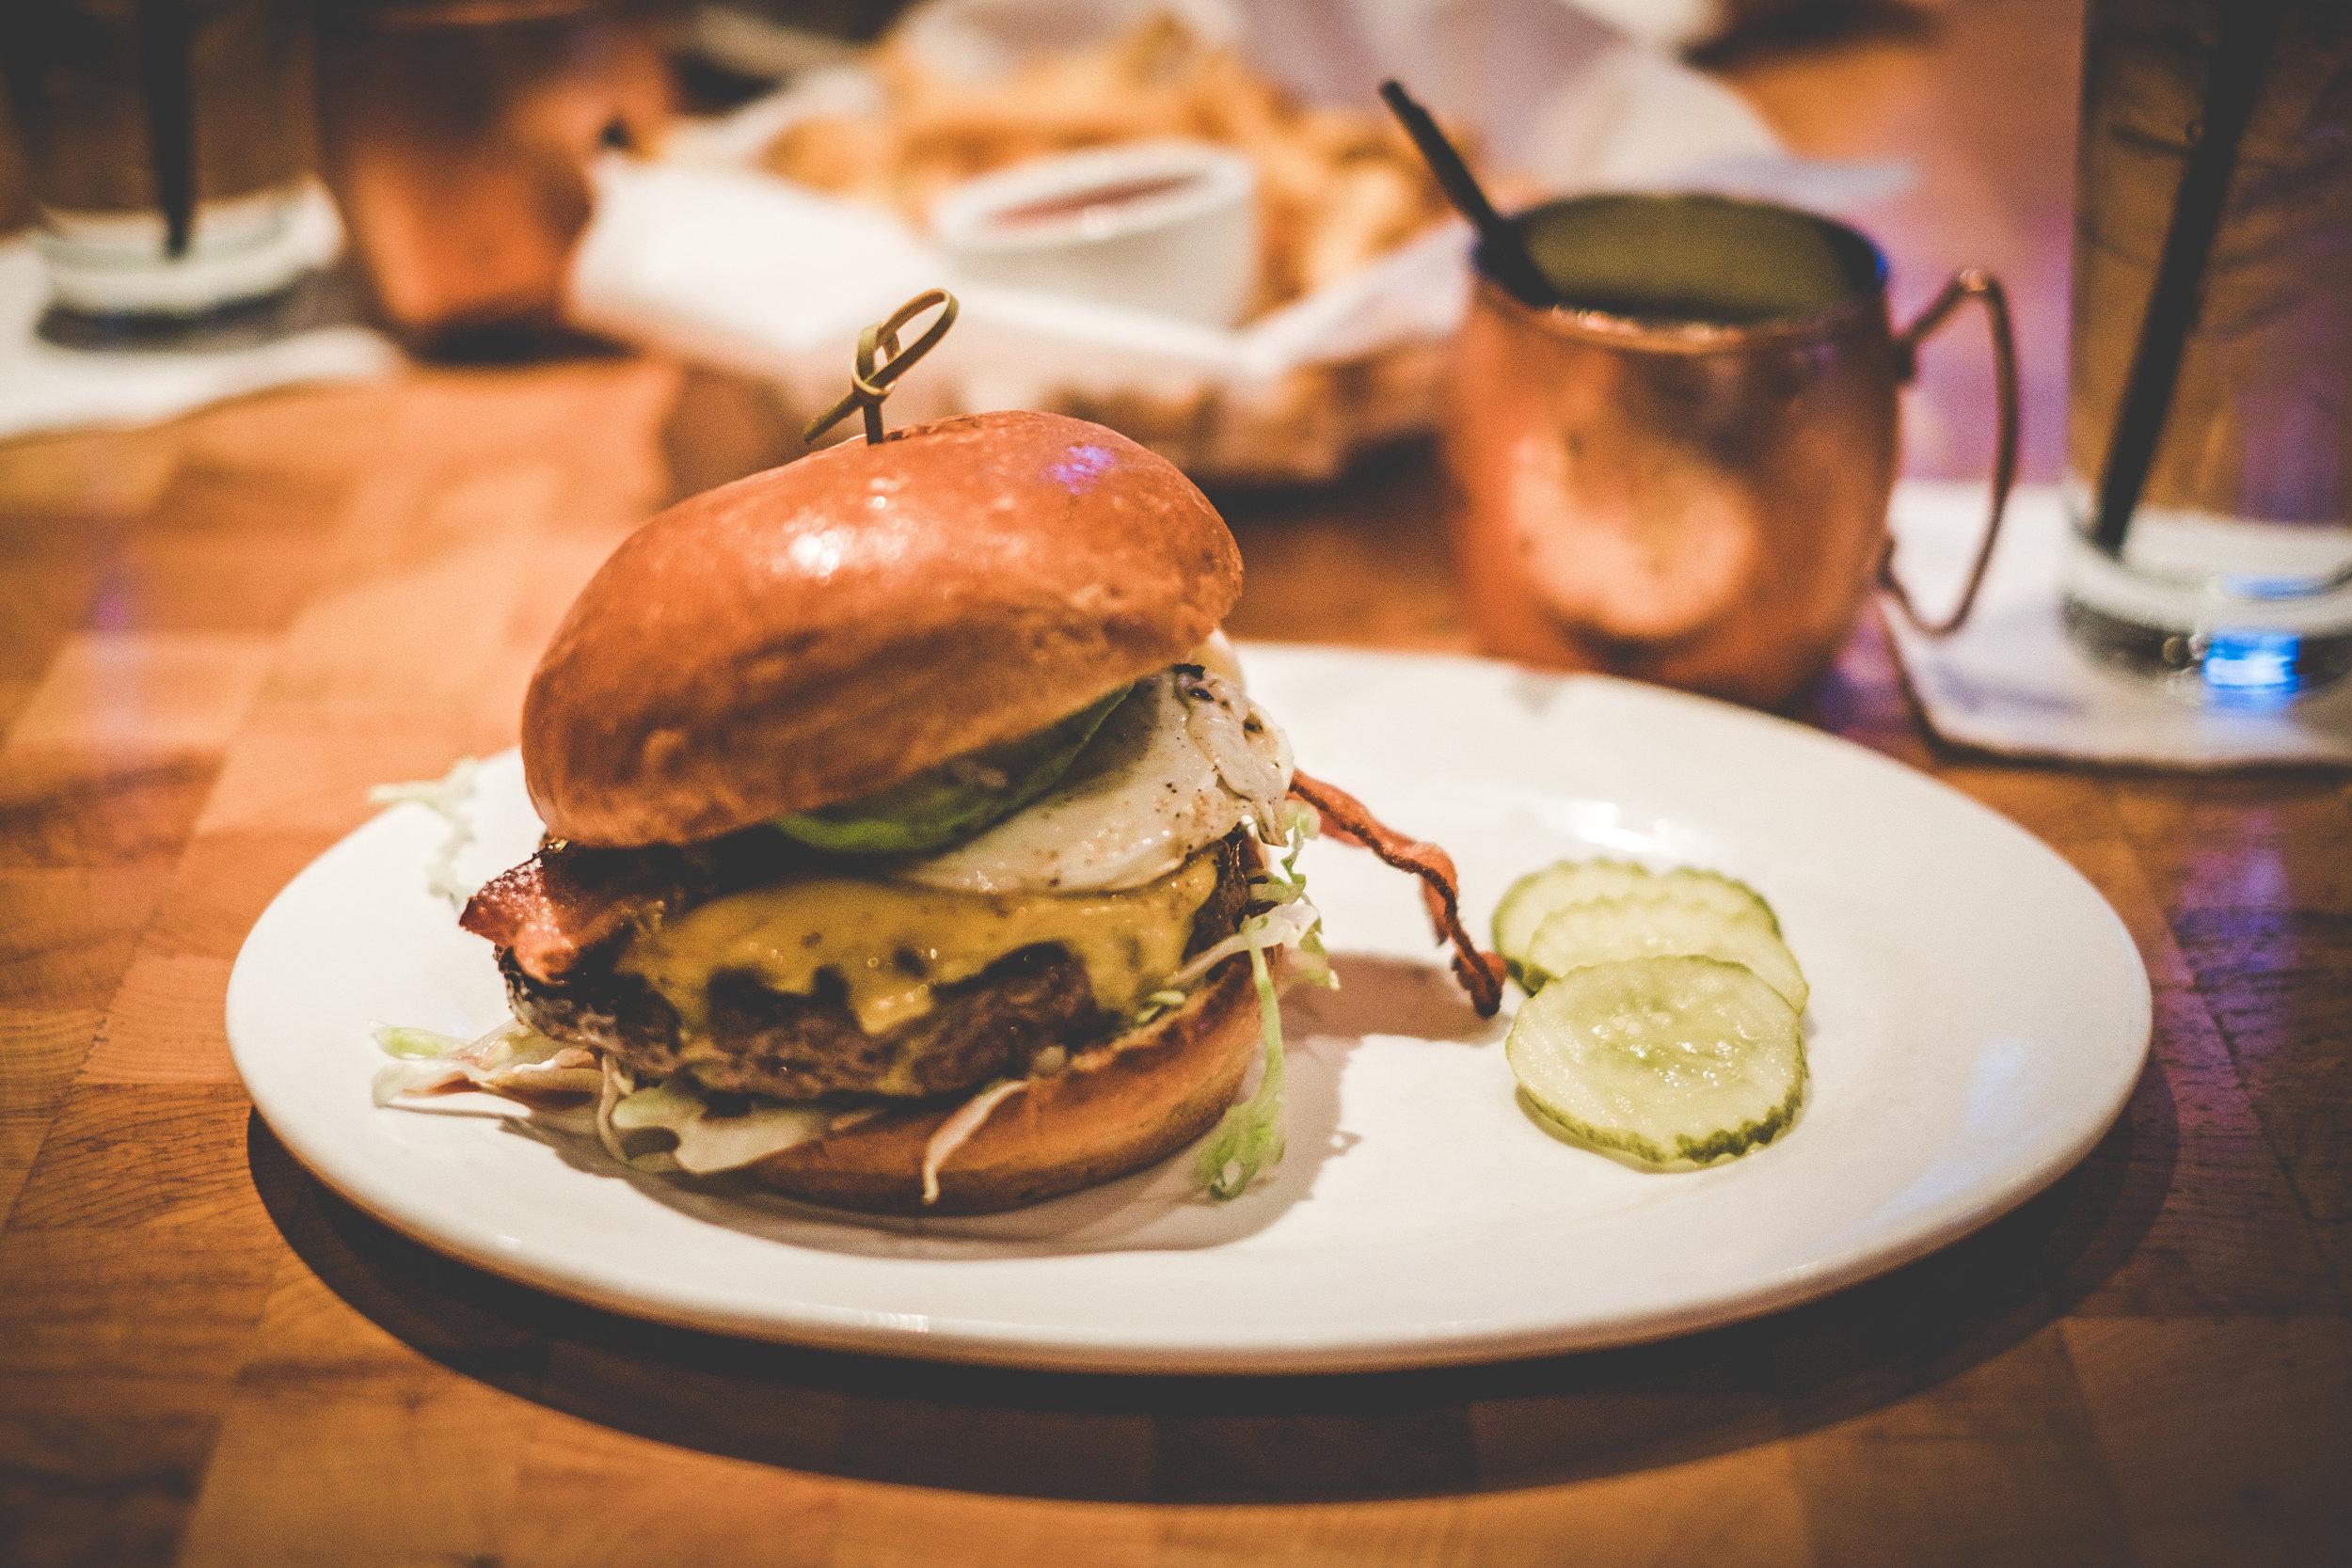 Zin burger with bae-4.jpg